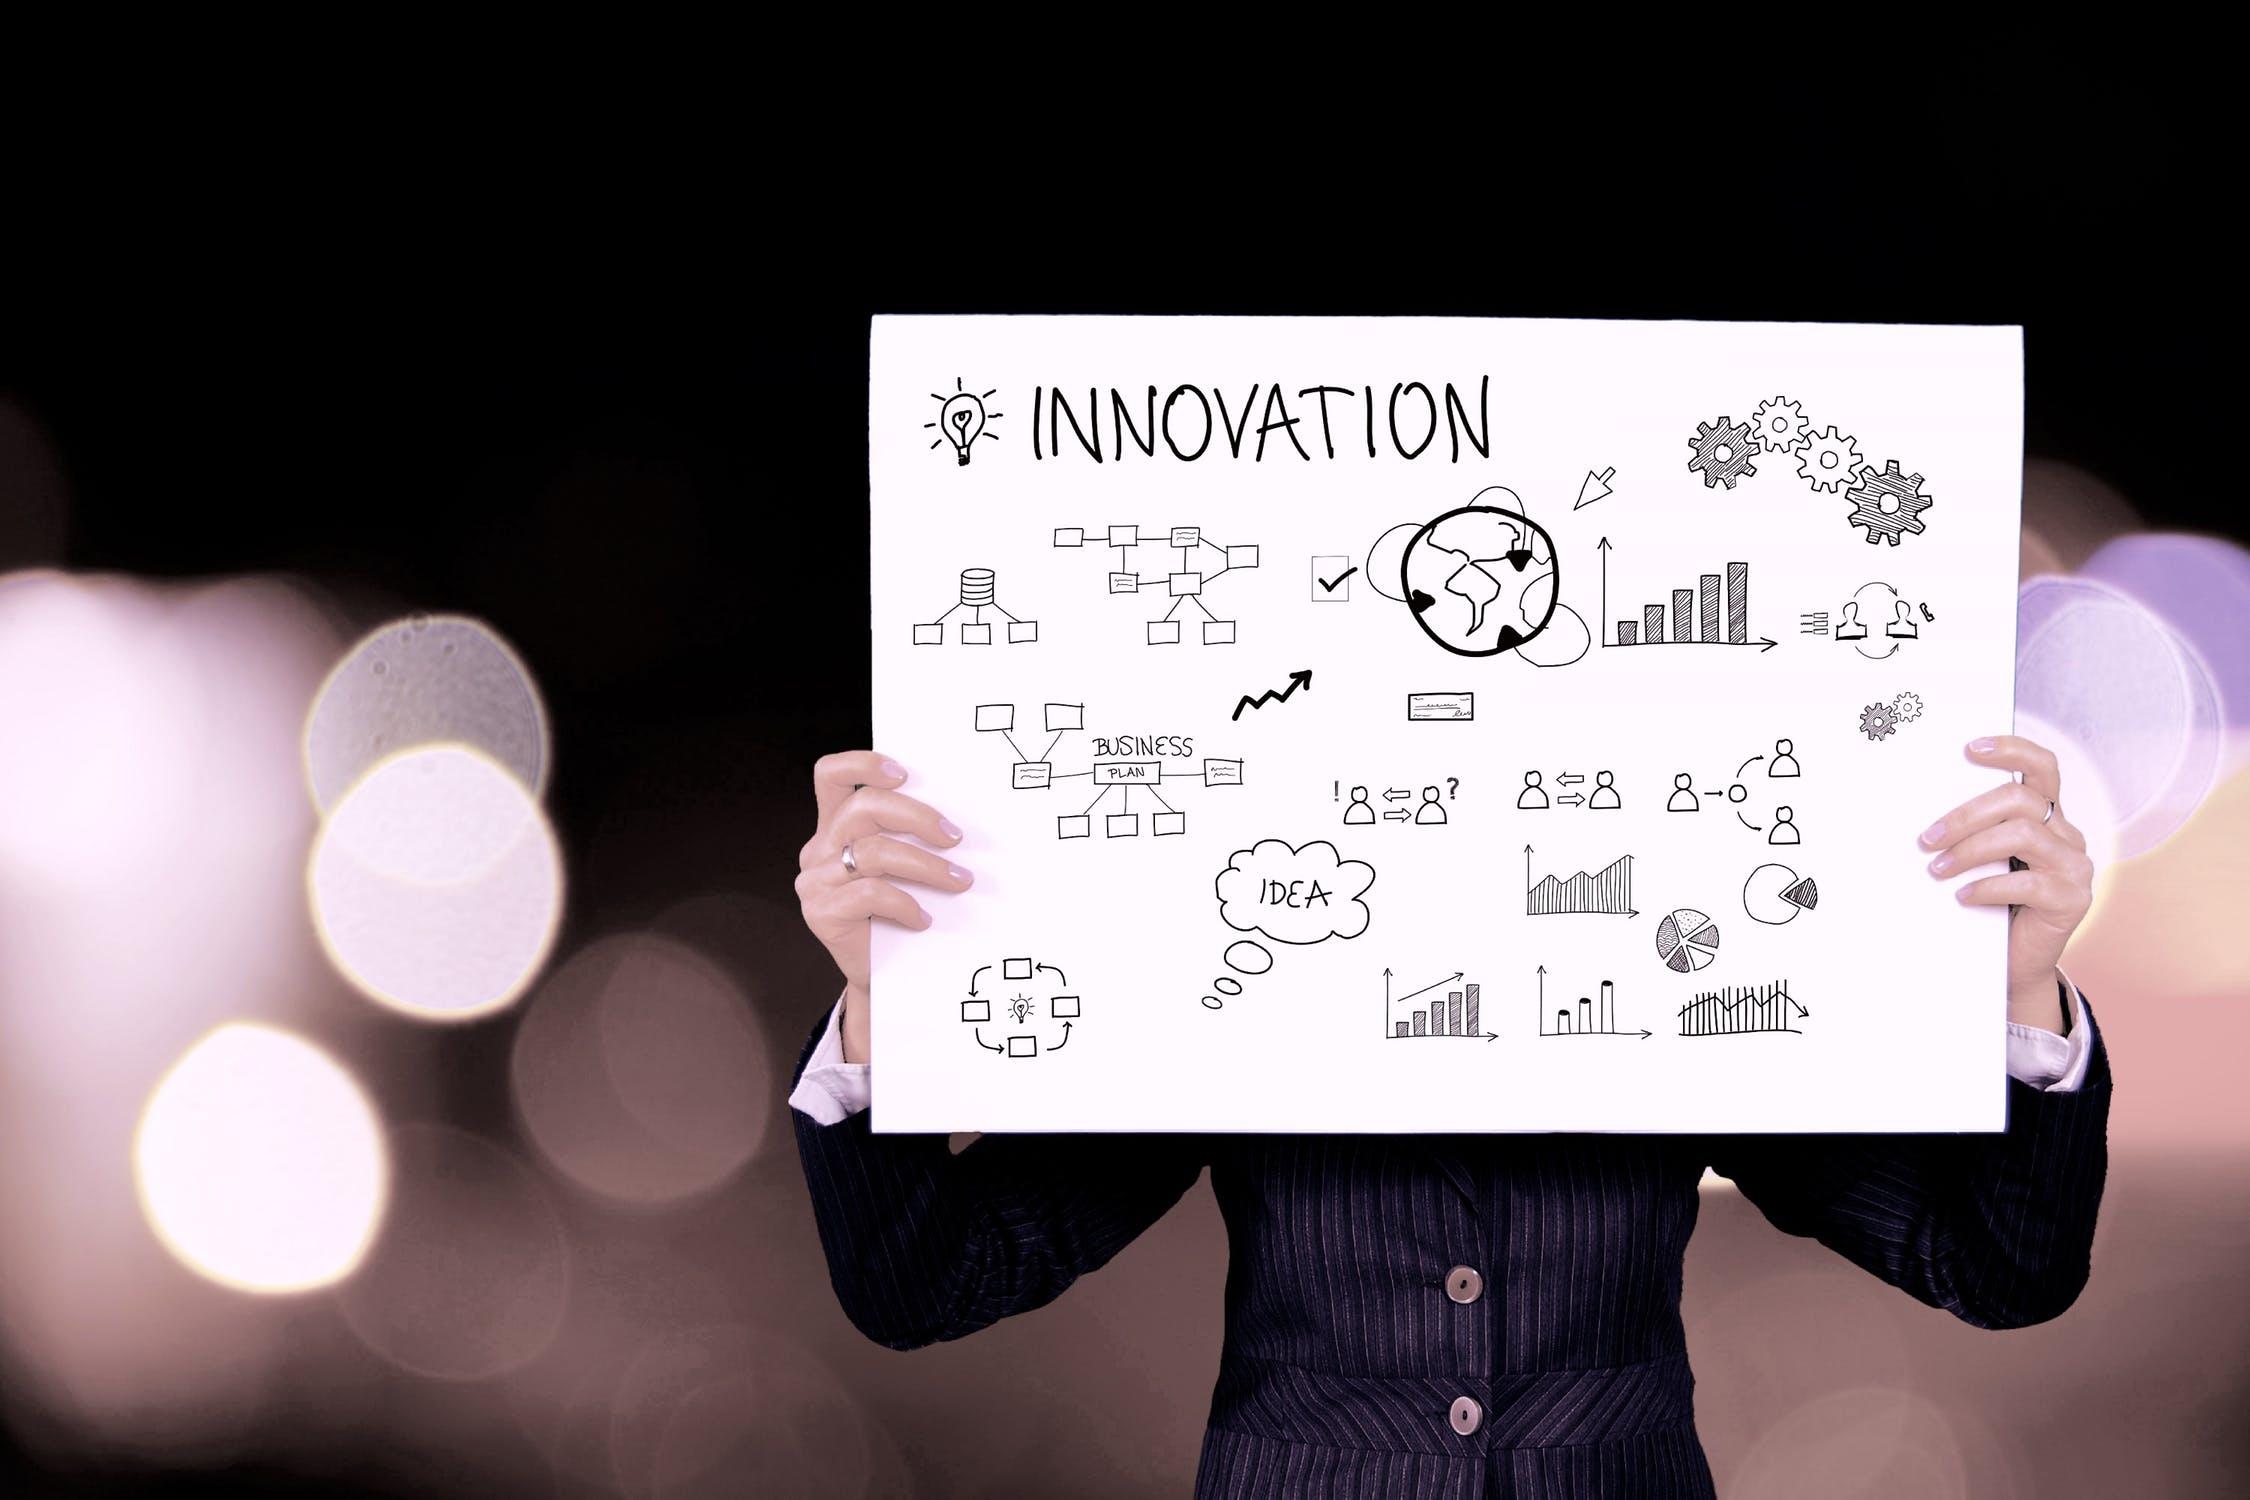 Как корпорациям работать со стартапами - Unlocking Innovation Through Startup Engagement